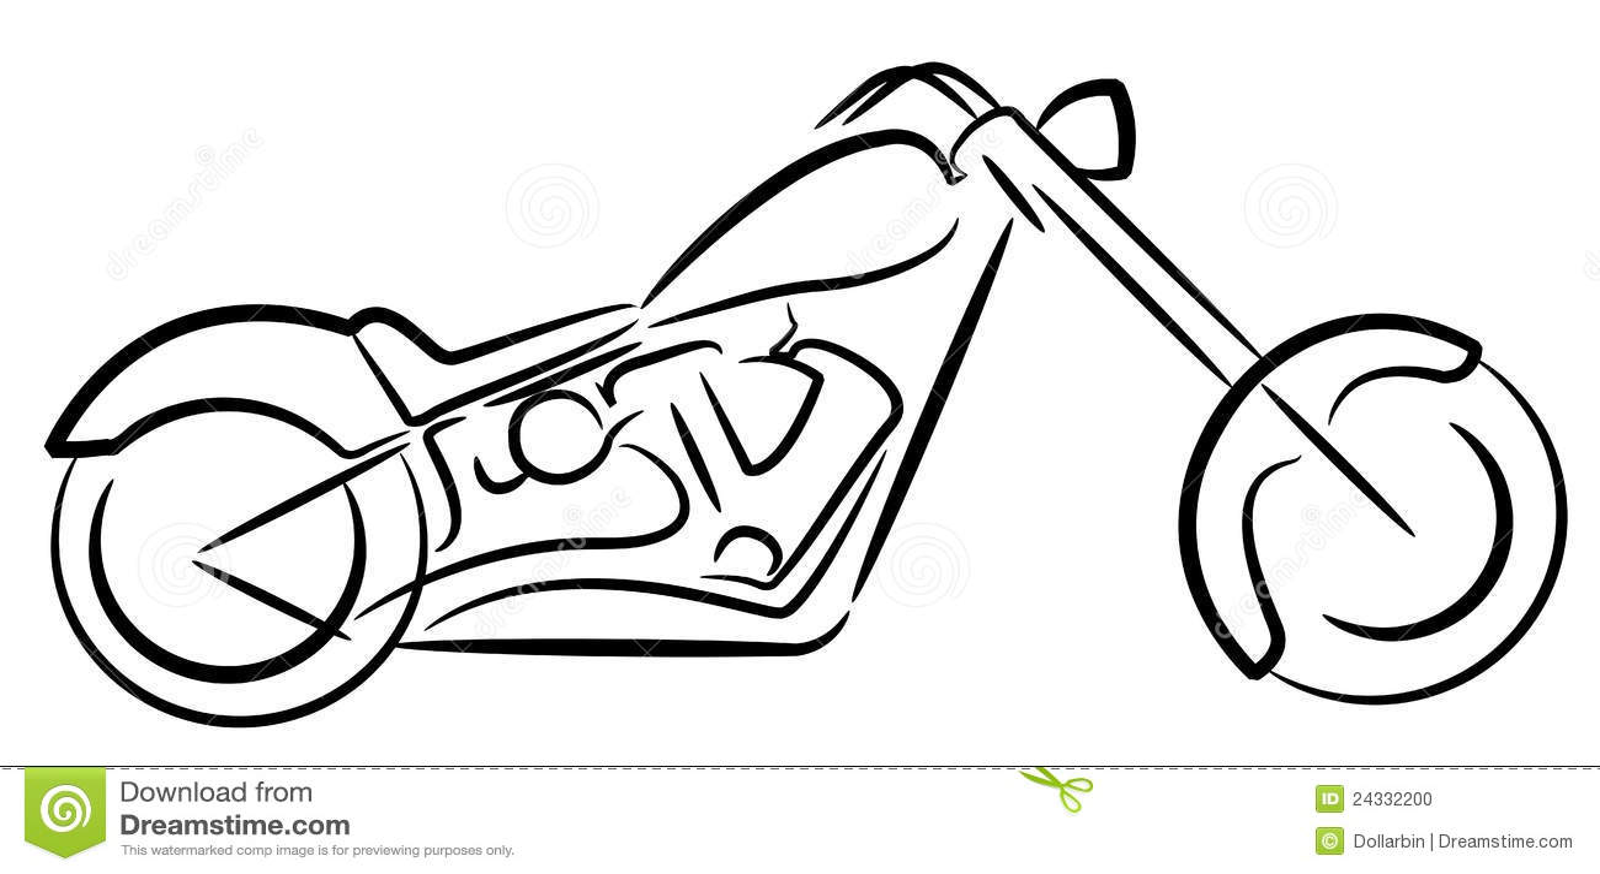 Motor cycle logo stock vector. Illustration of cruiser